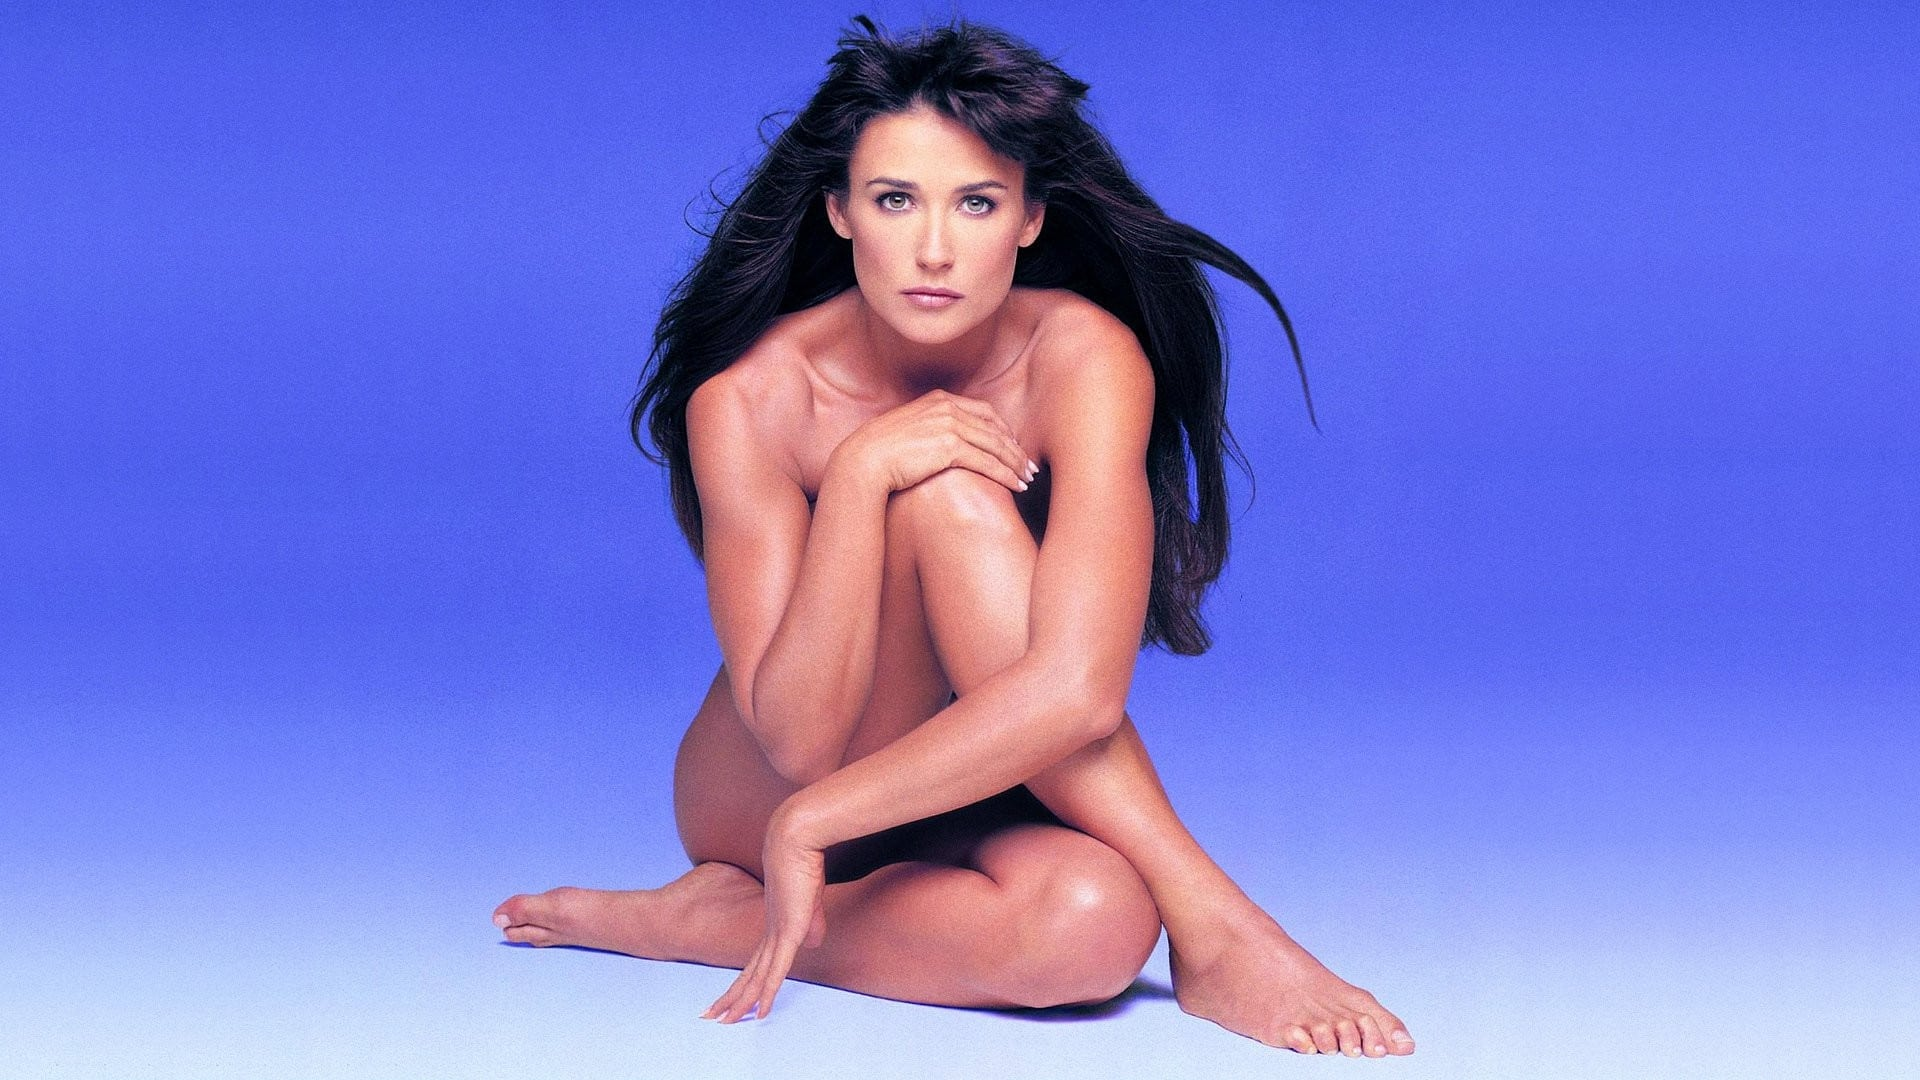 Striptease Demi Moore Editorial Stock Photo